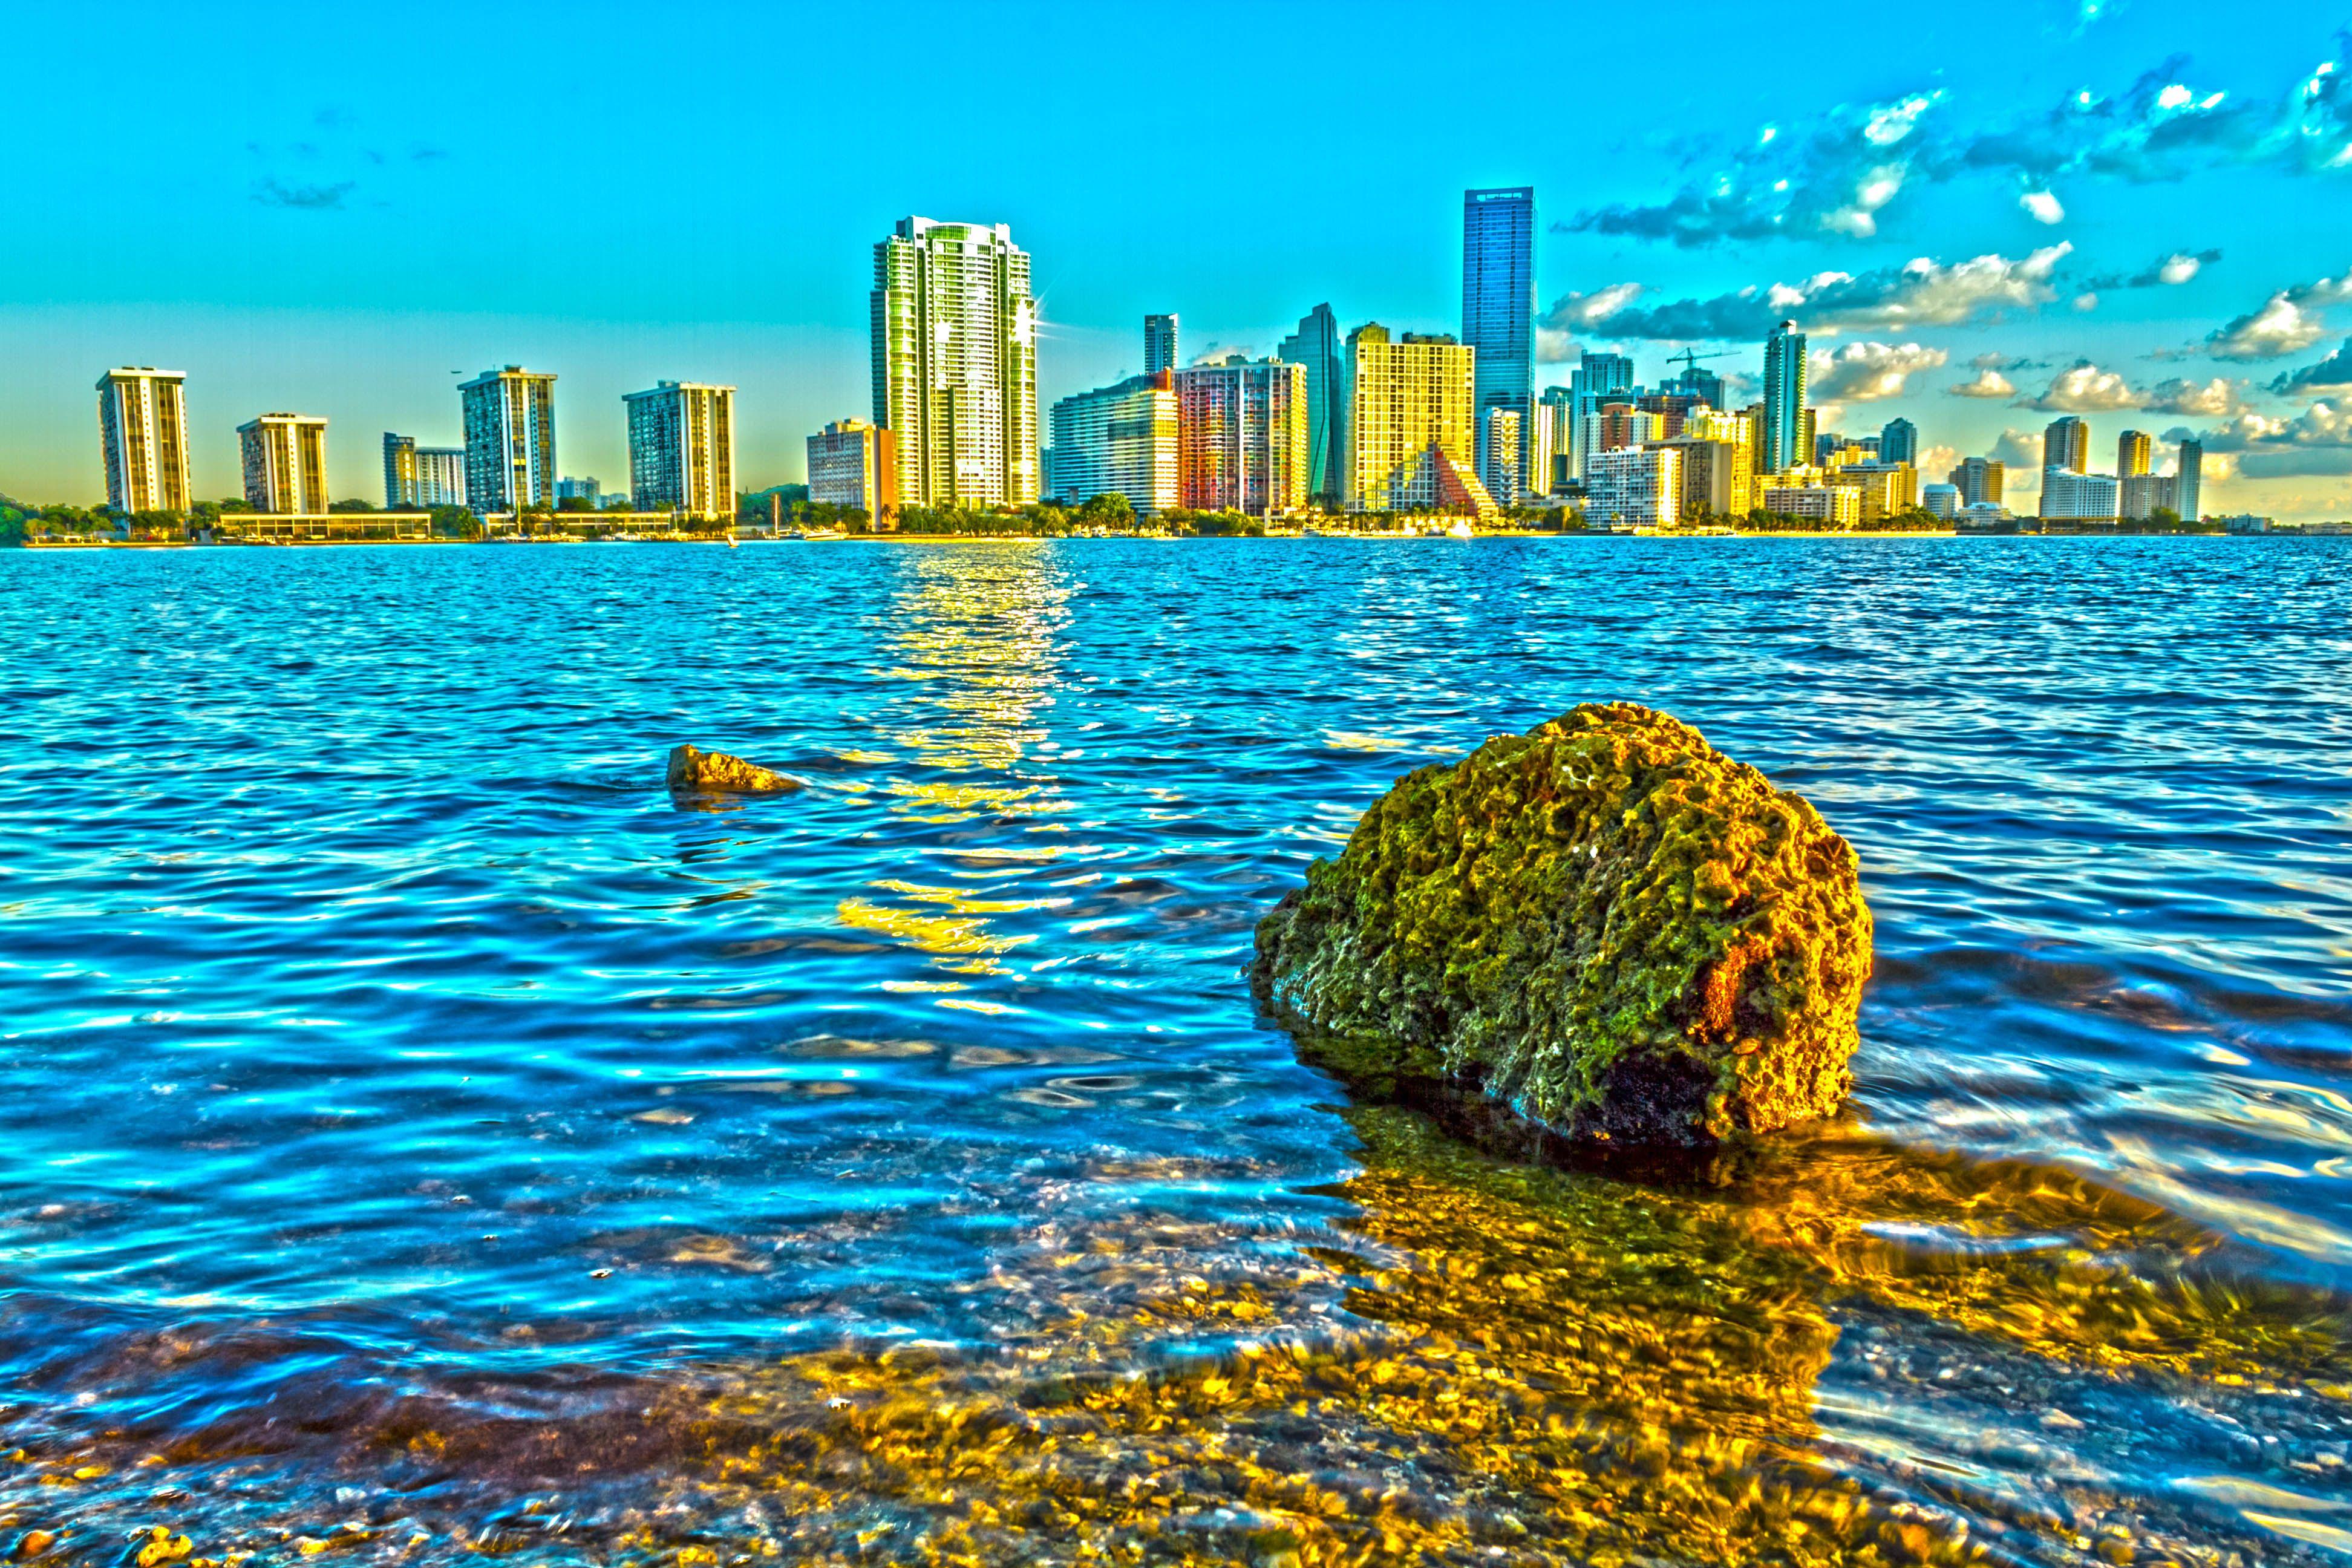 Biscayne Bay, Miami Florida